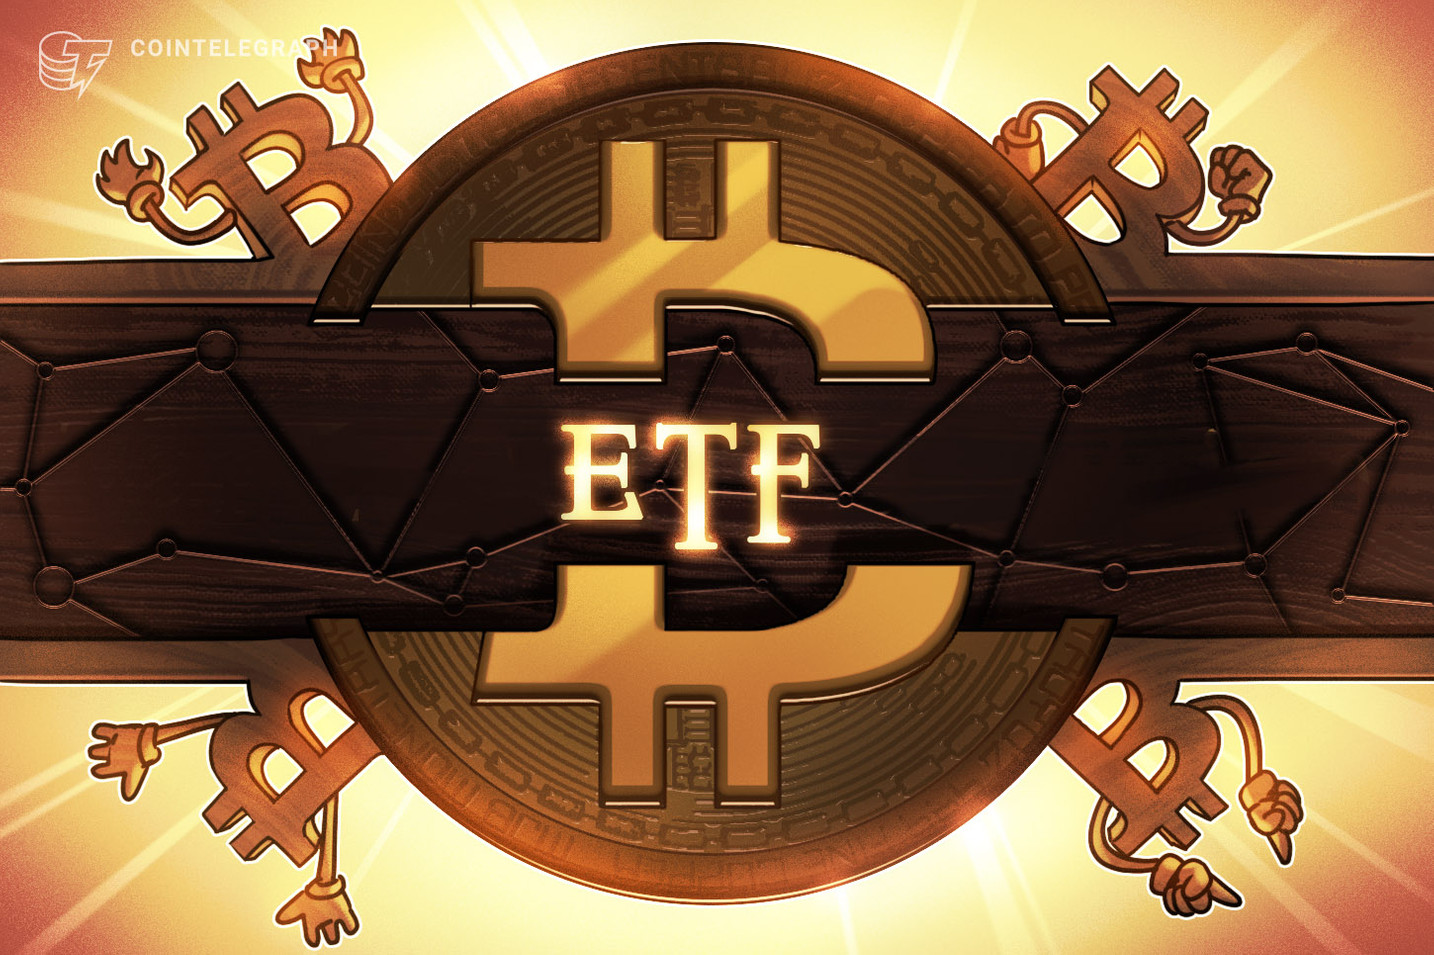 Asset management giant Fidelity files for Bitcoin ETF